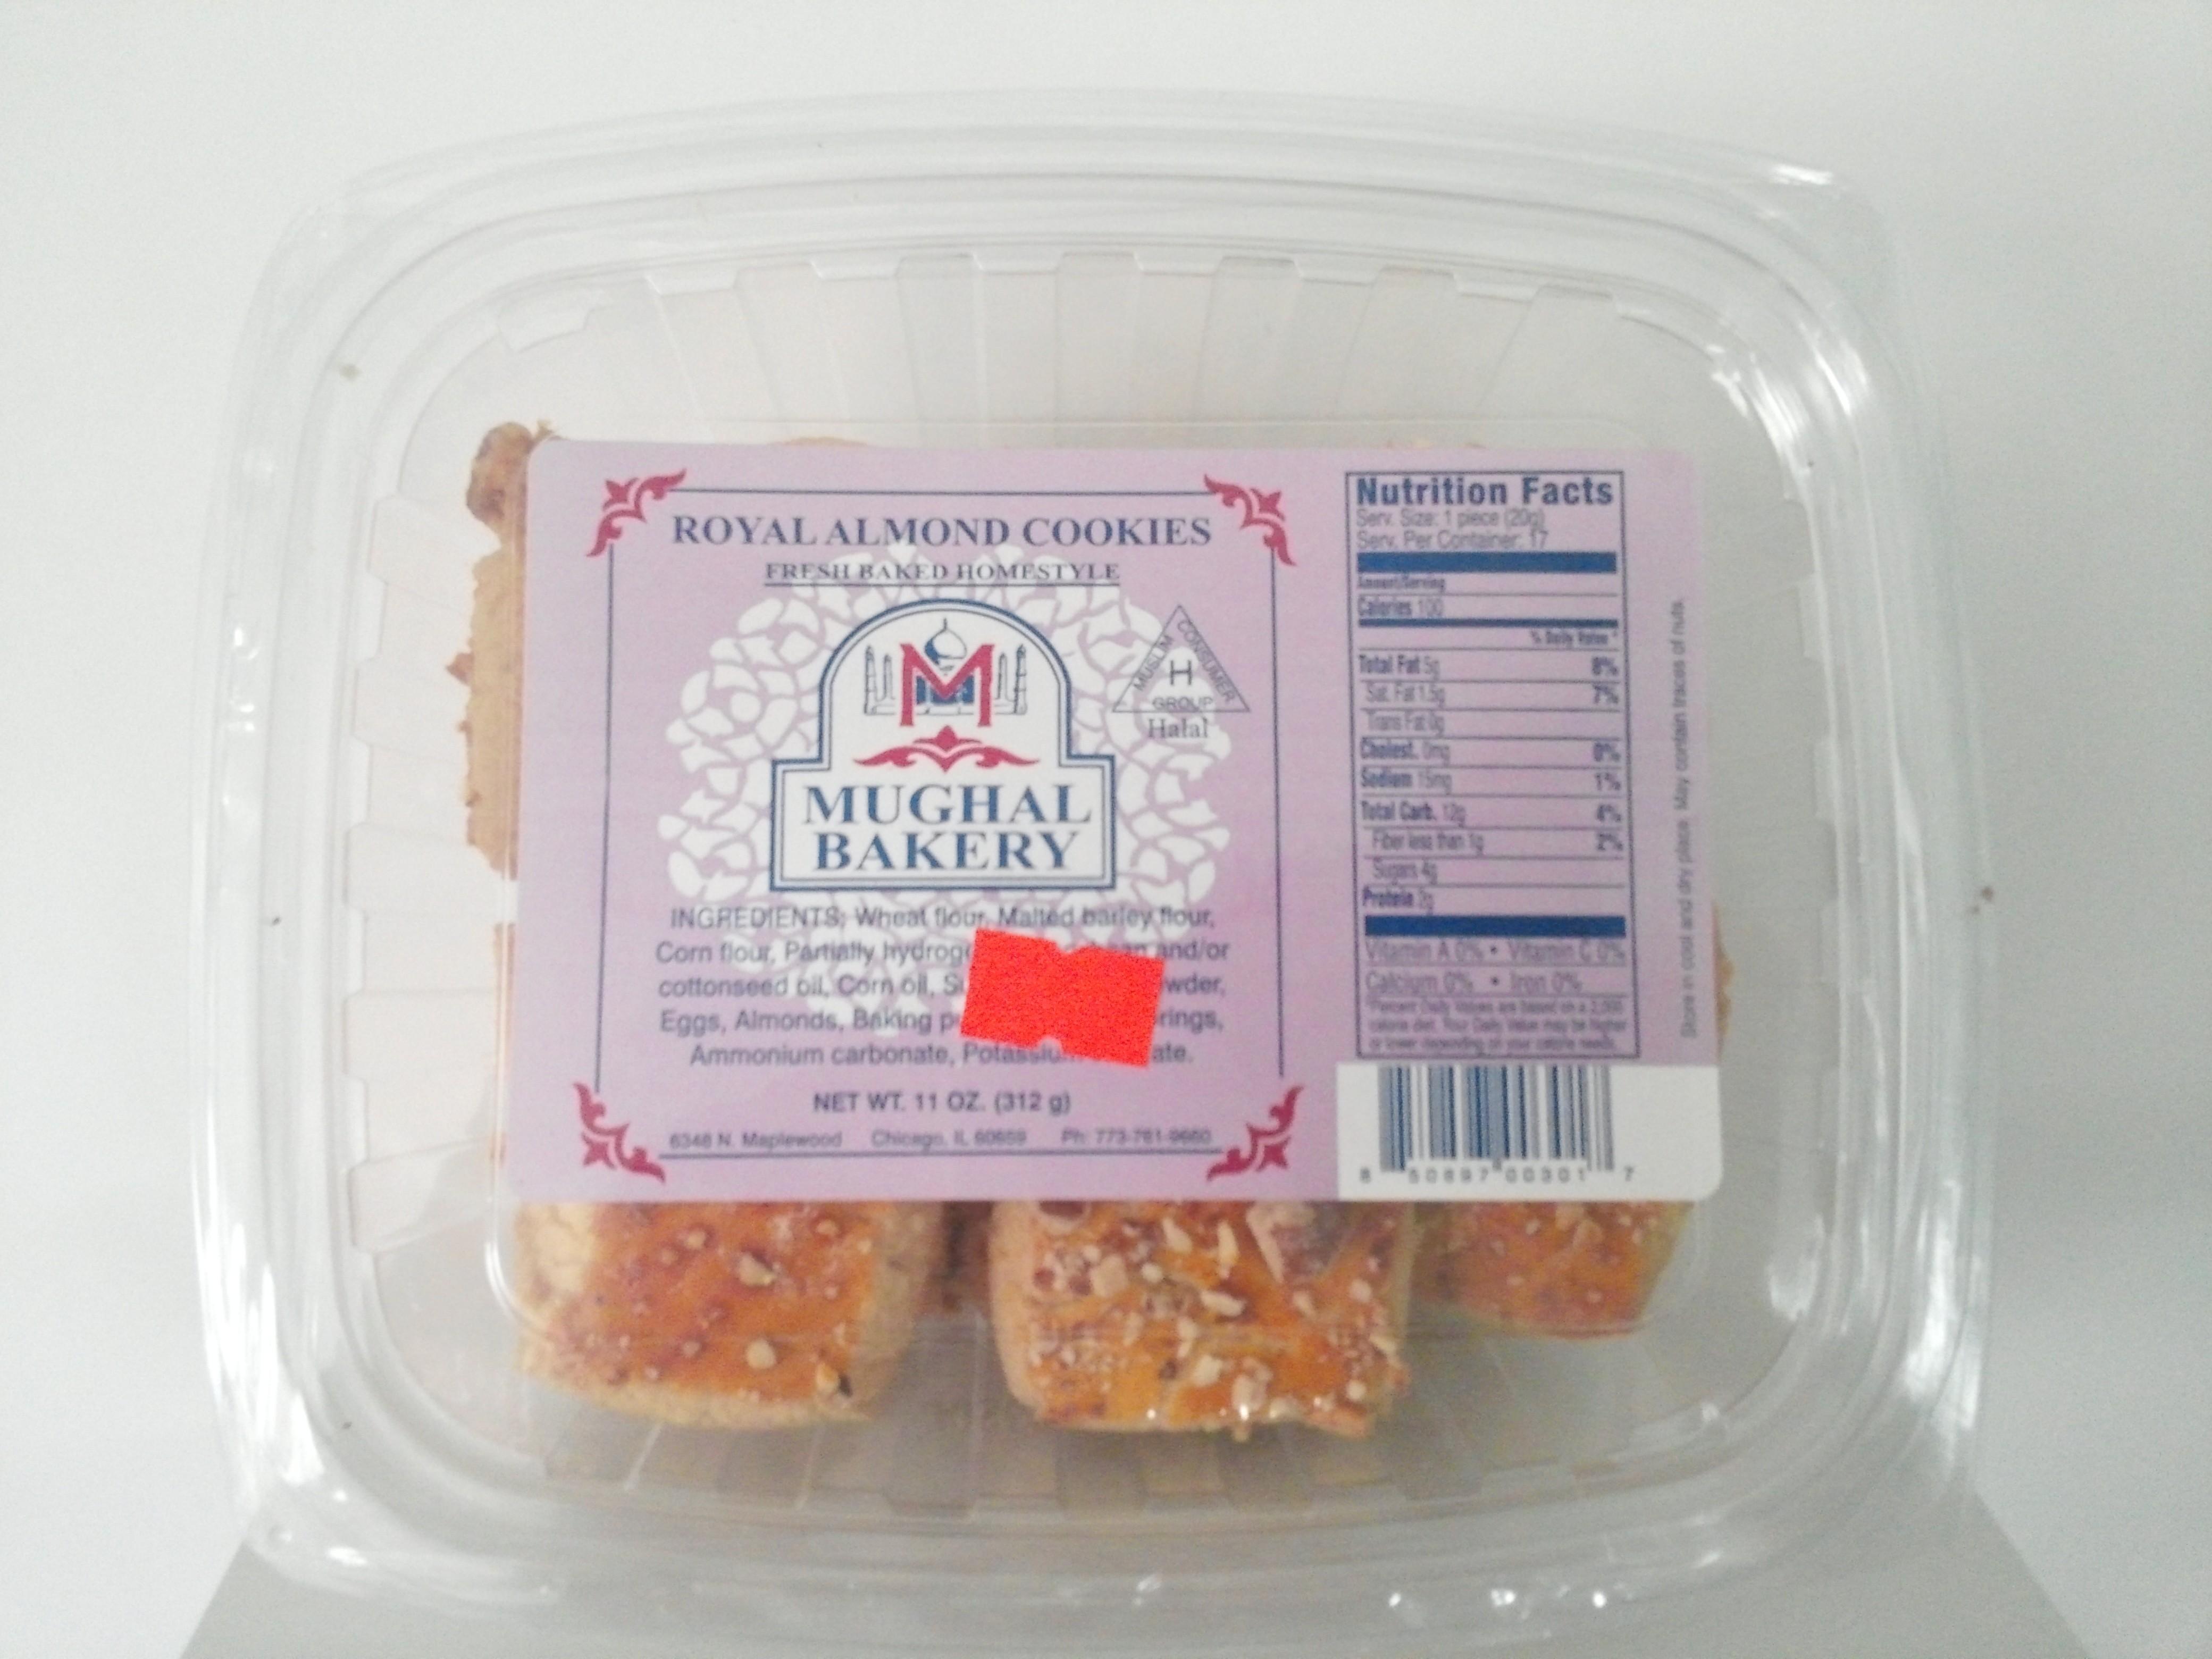 Mughal Bakery Royal Almond Cookies 11 oz